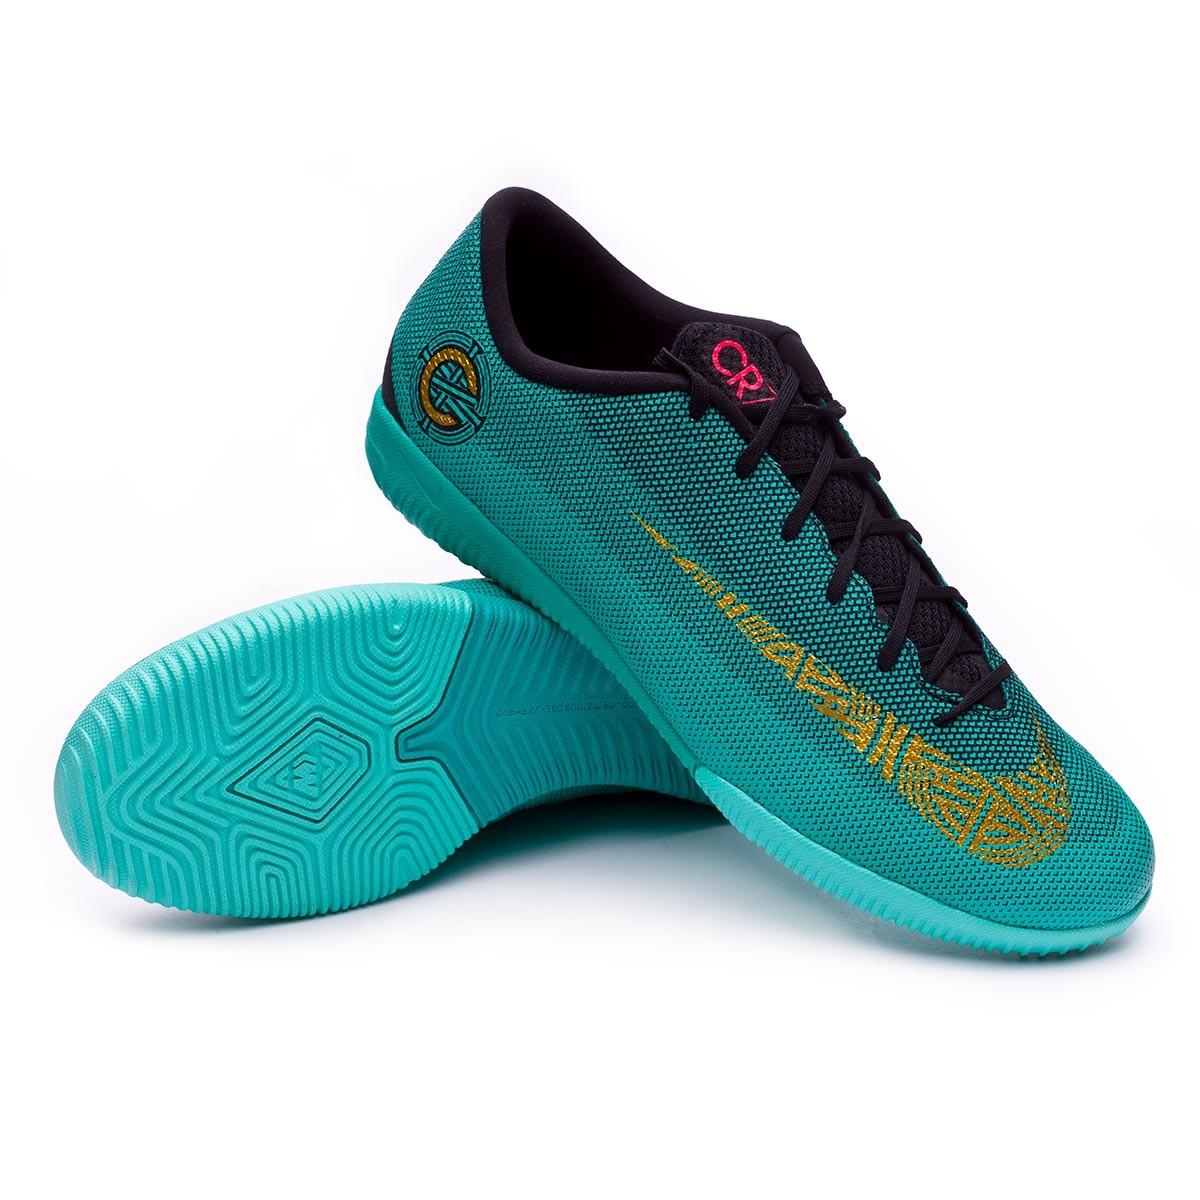 a0588ad7286 Nike Mercurial VaporX XII Academy CR7 IC Futsal Boot. Clear jade-Metallic  vivid ...